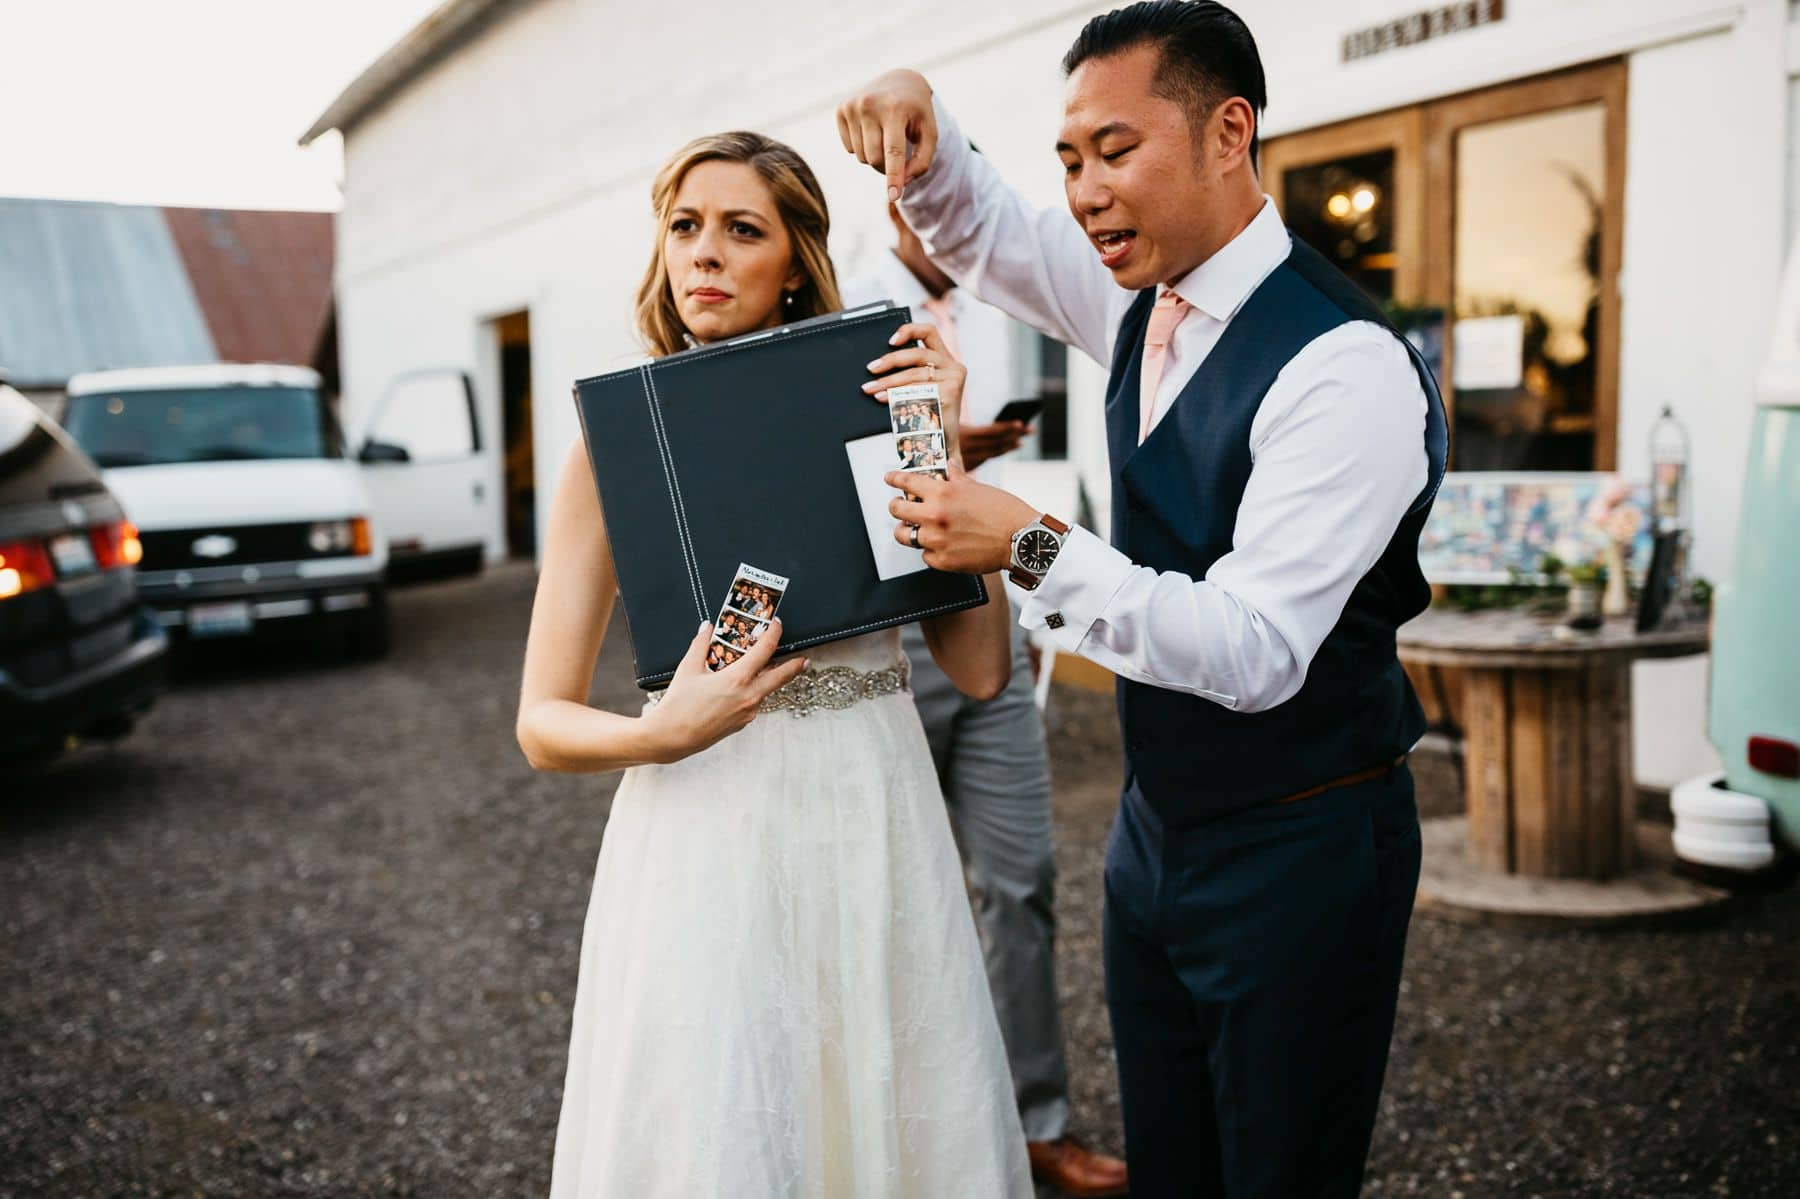 dairyland wedding snohomish photobooth